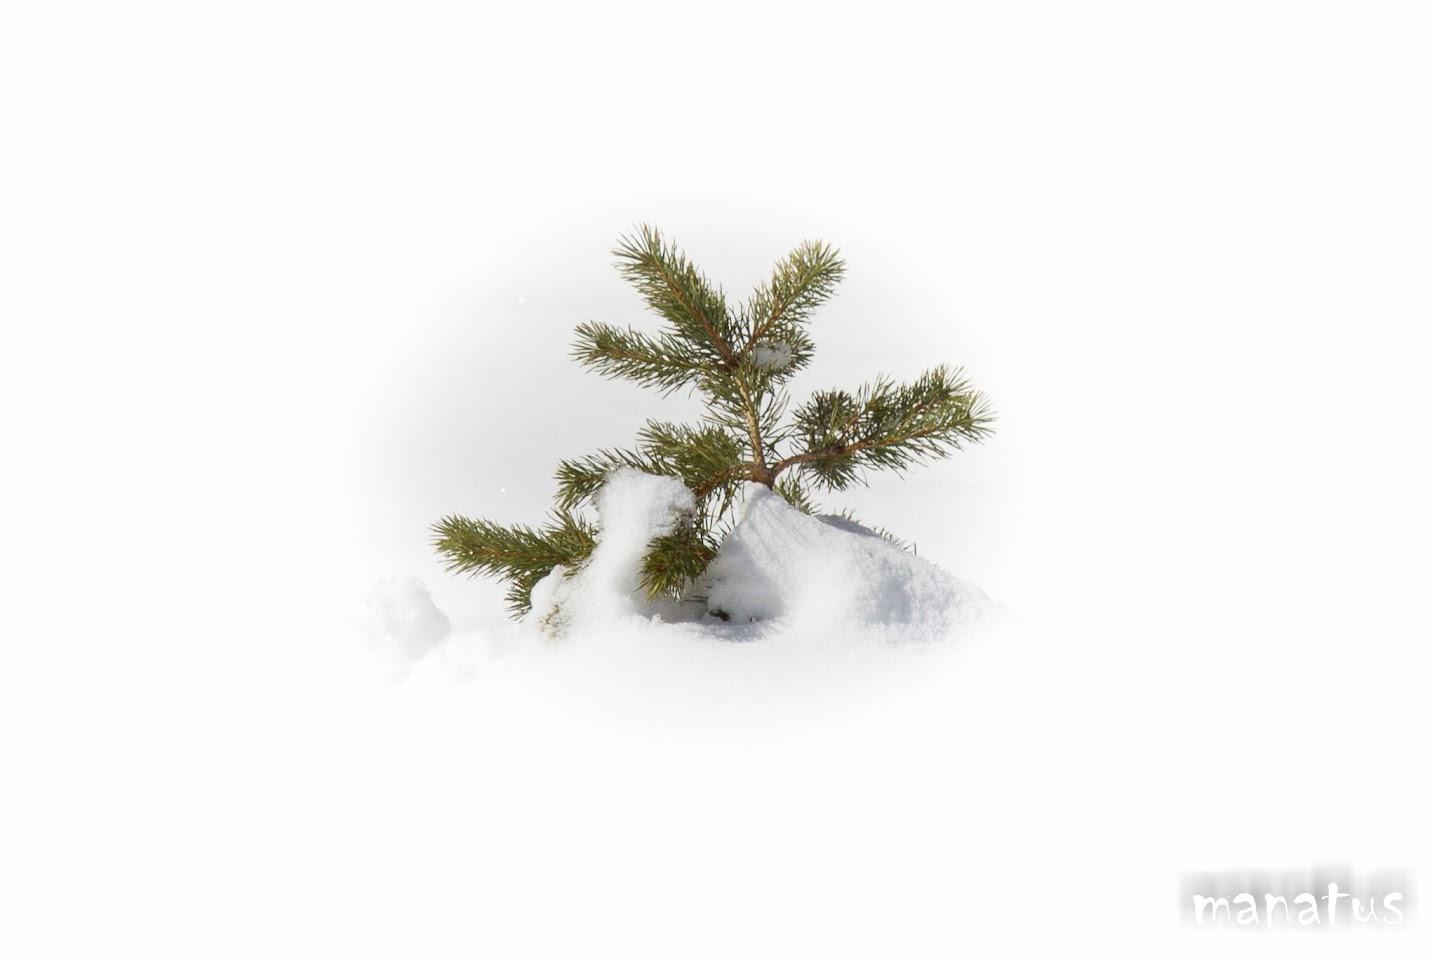 punta de pino manatus